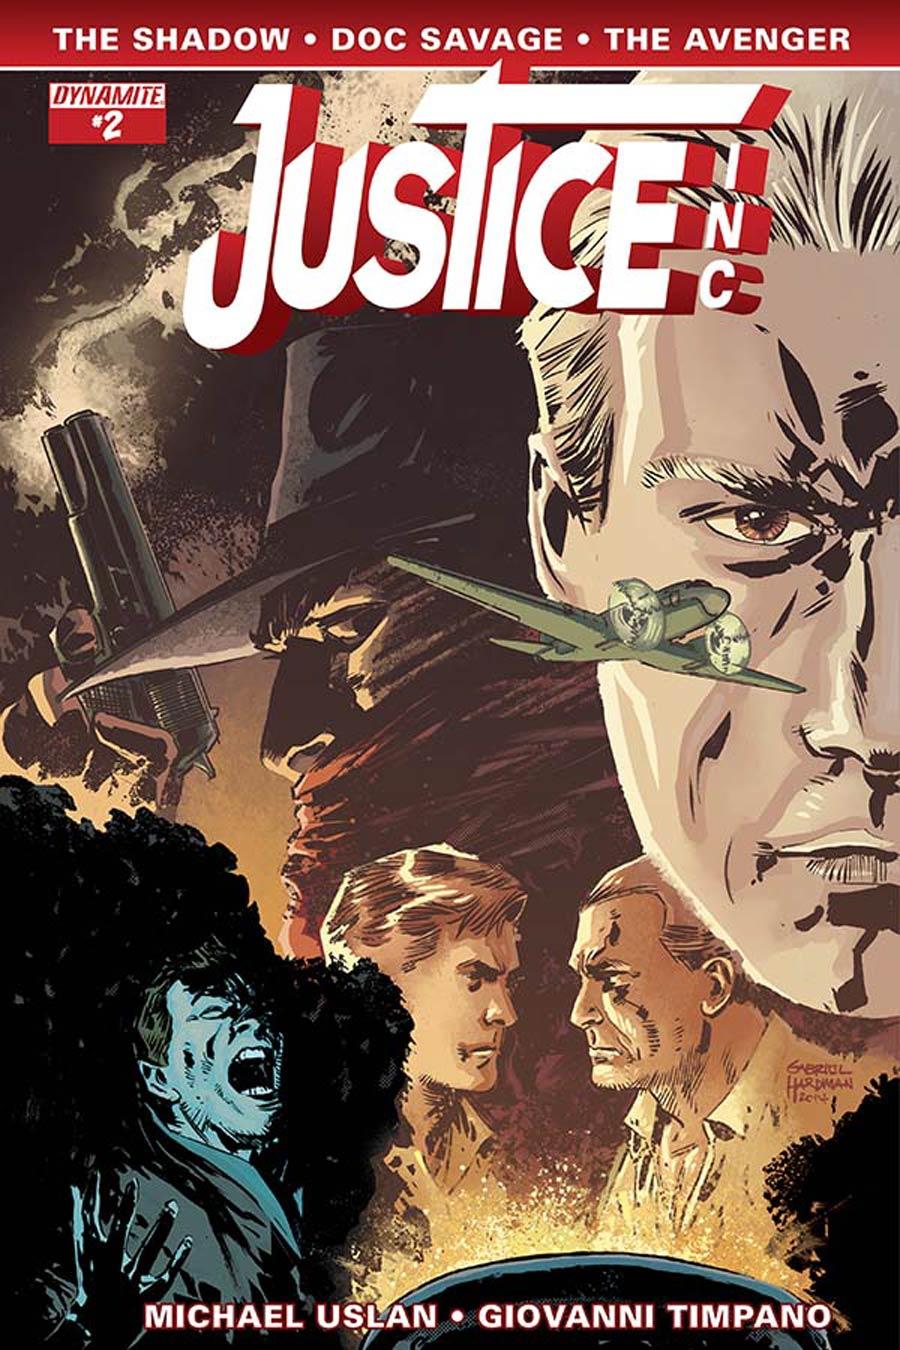 Justice Inc Vol 3 #2 Cover C Variant Gabriel Hardman Cover